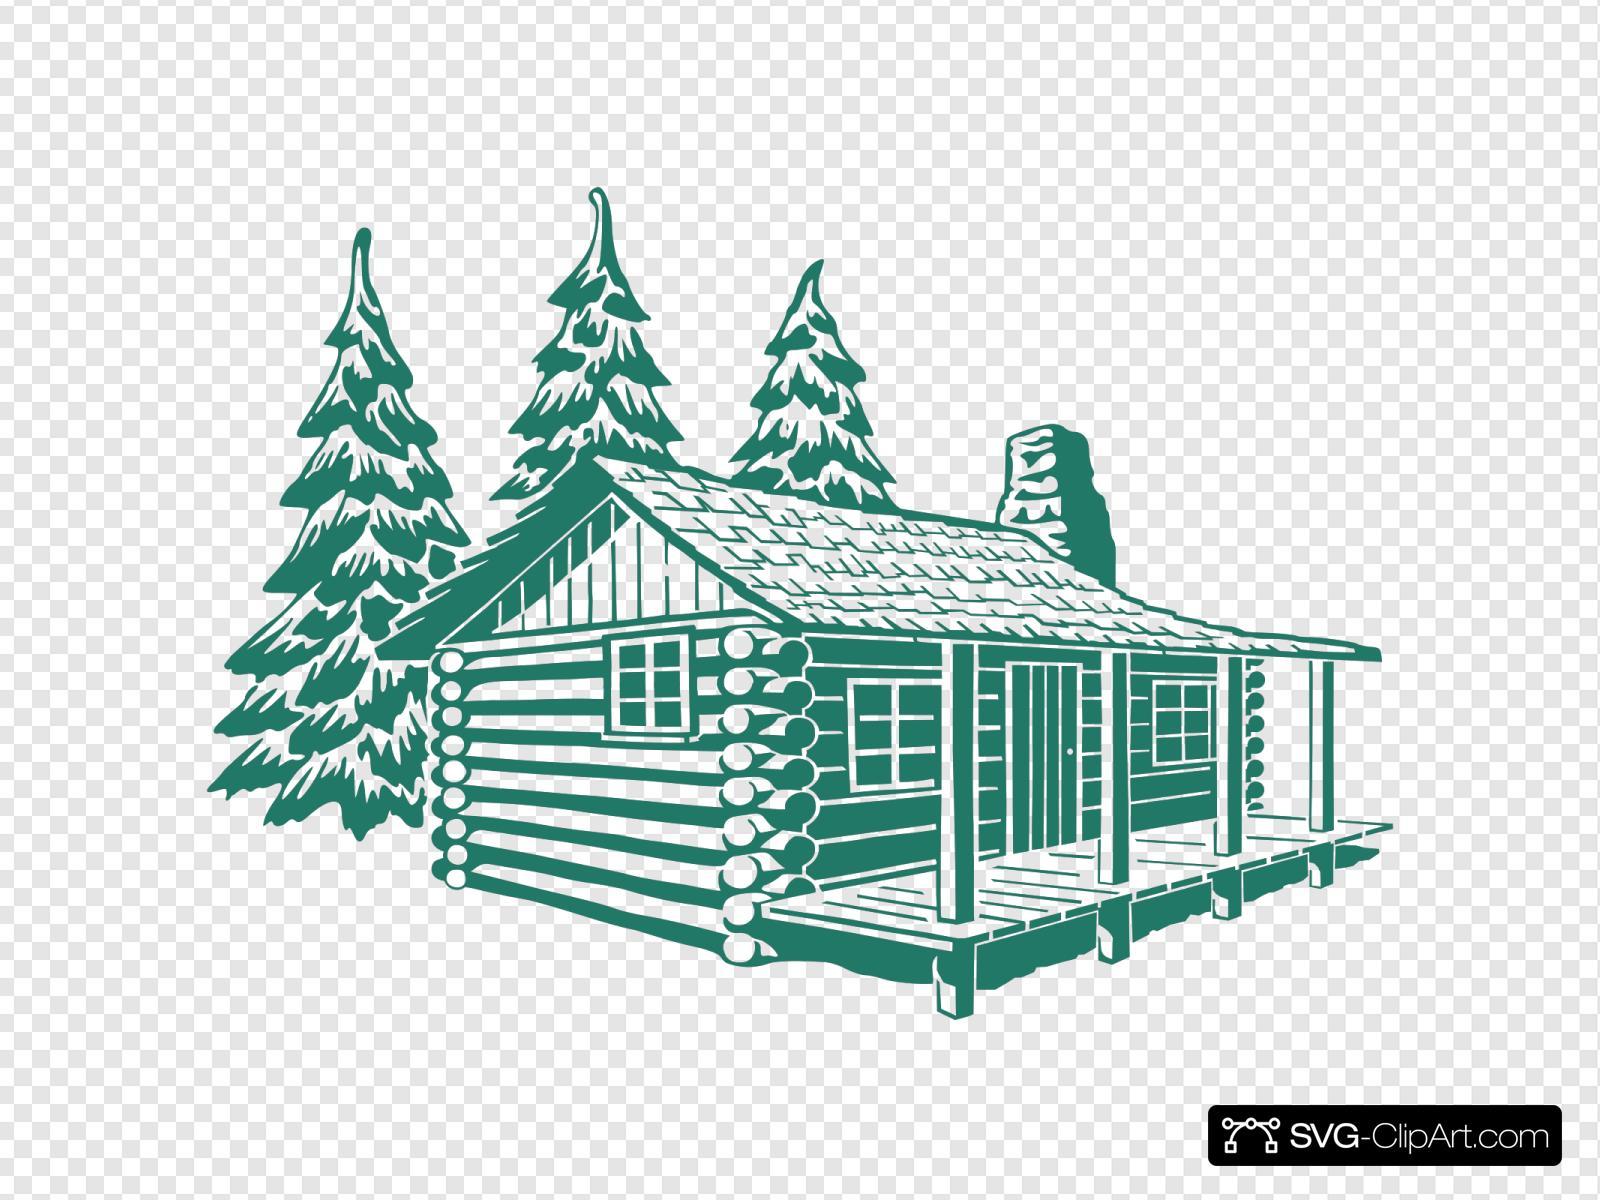 Log Cabin Svg Vector Log Cabin Clip Art Svg Clipart